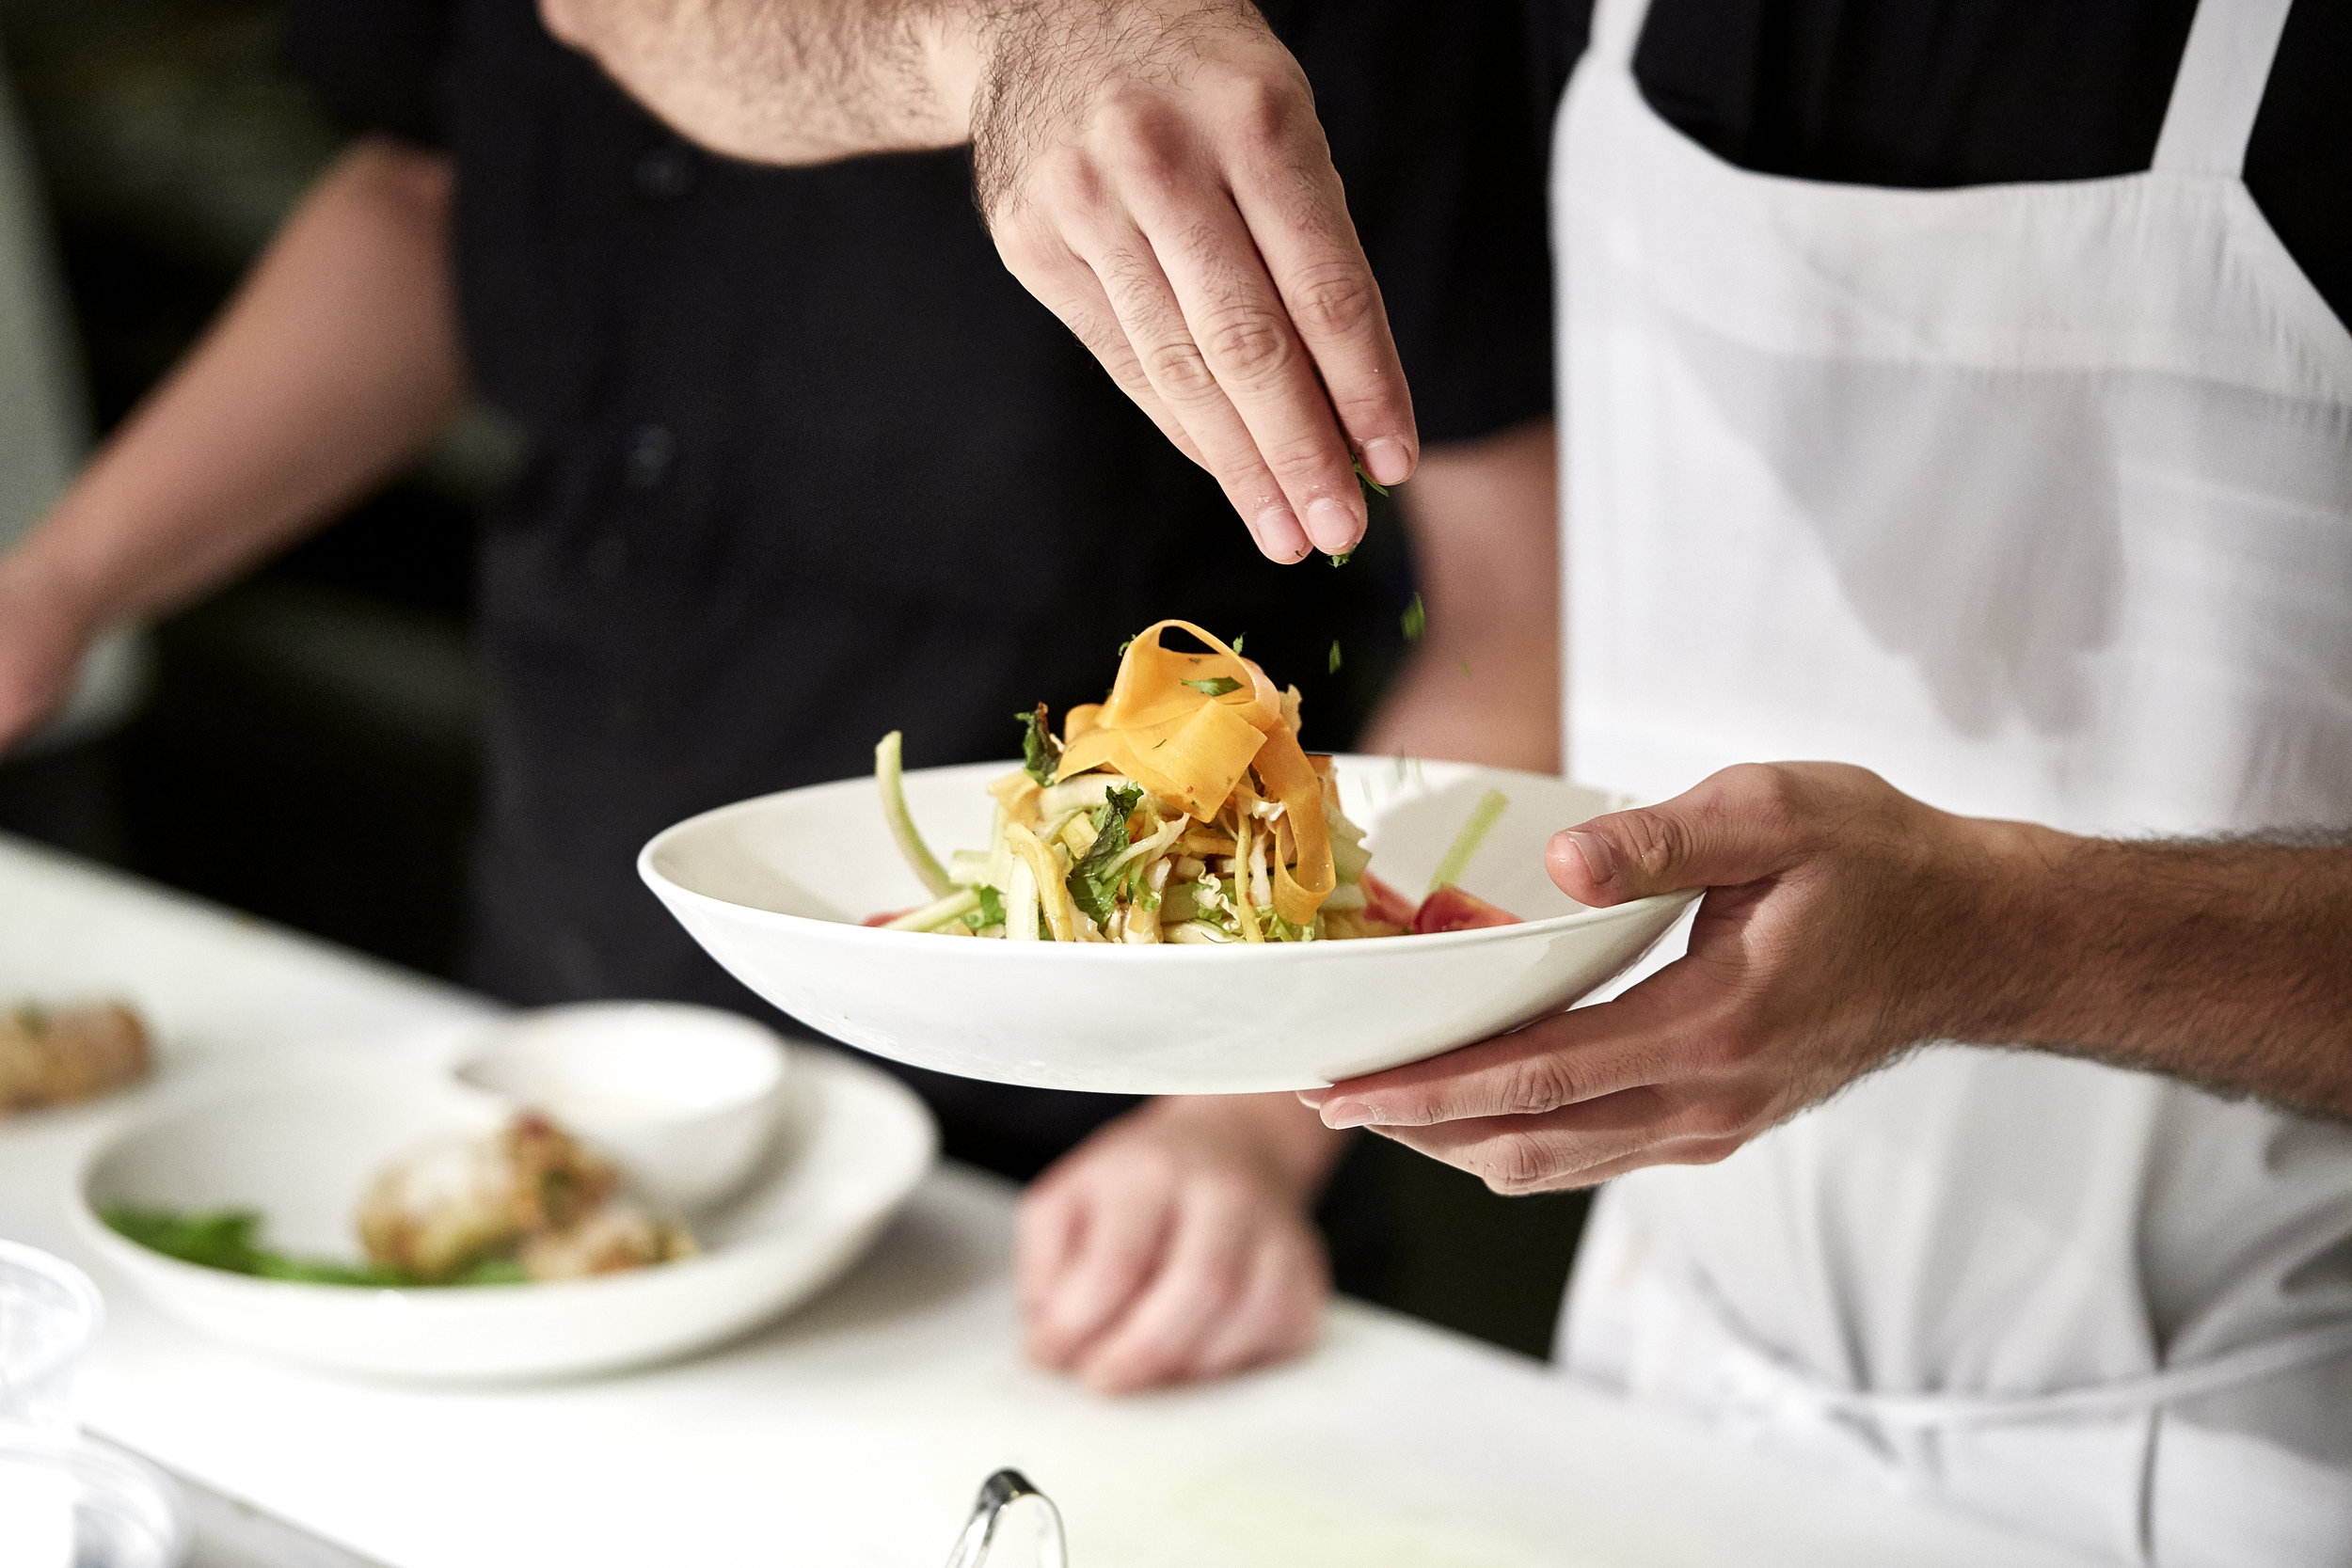 Toque Agency: The Merchant Kitchen, Winnipeg, Mango Salad.